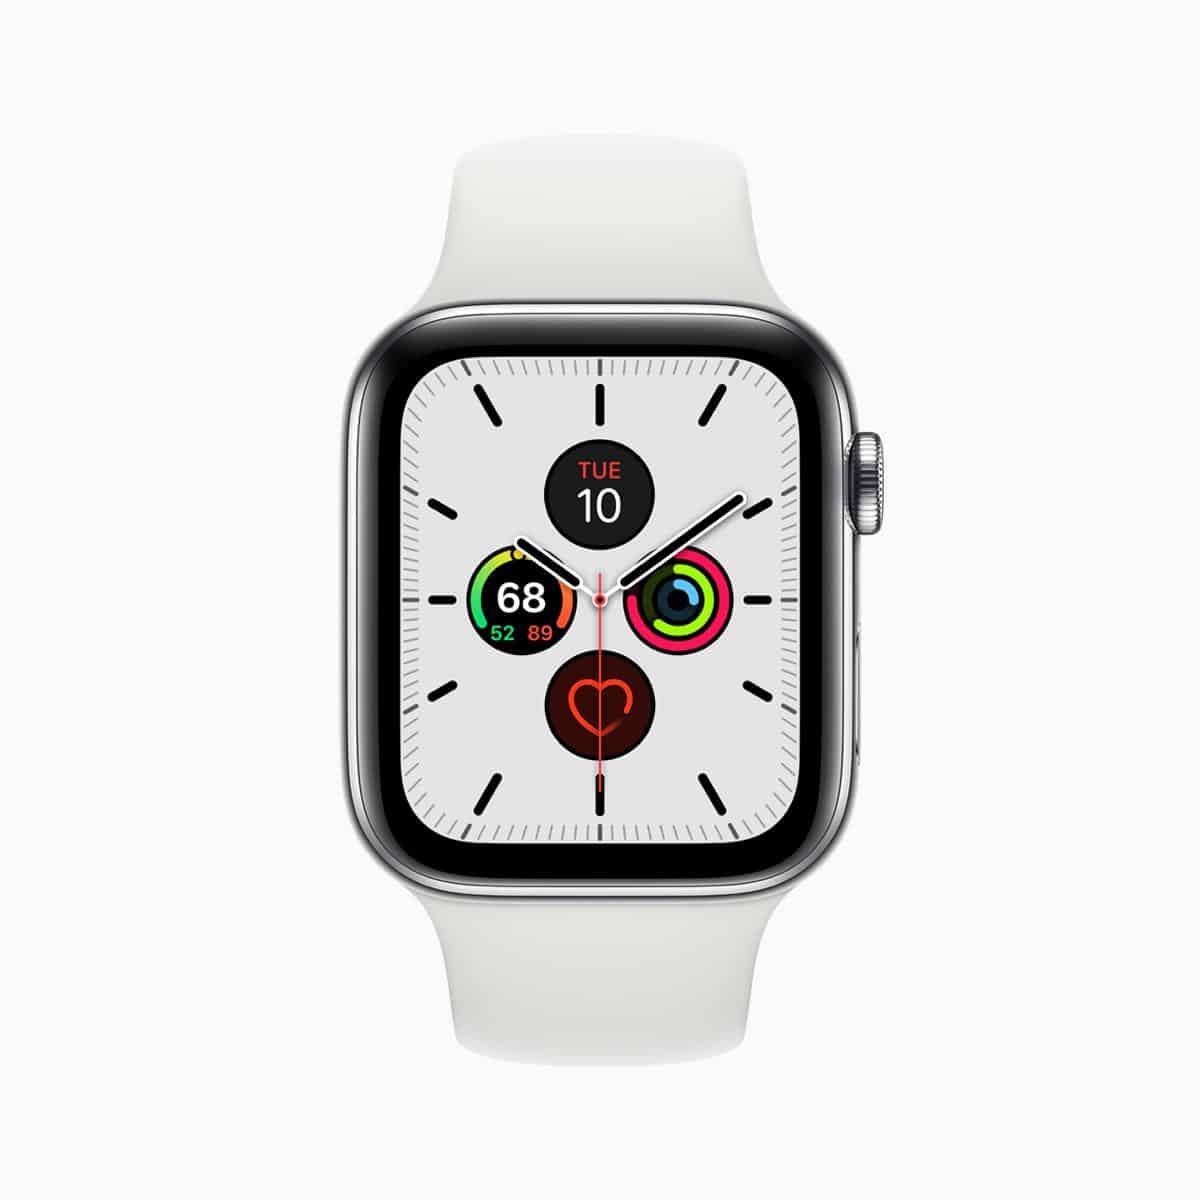 Apple watch series 5 meridian face 091019